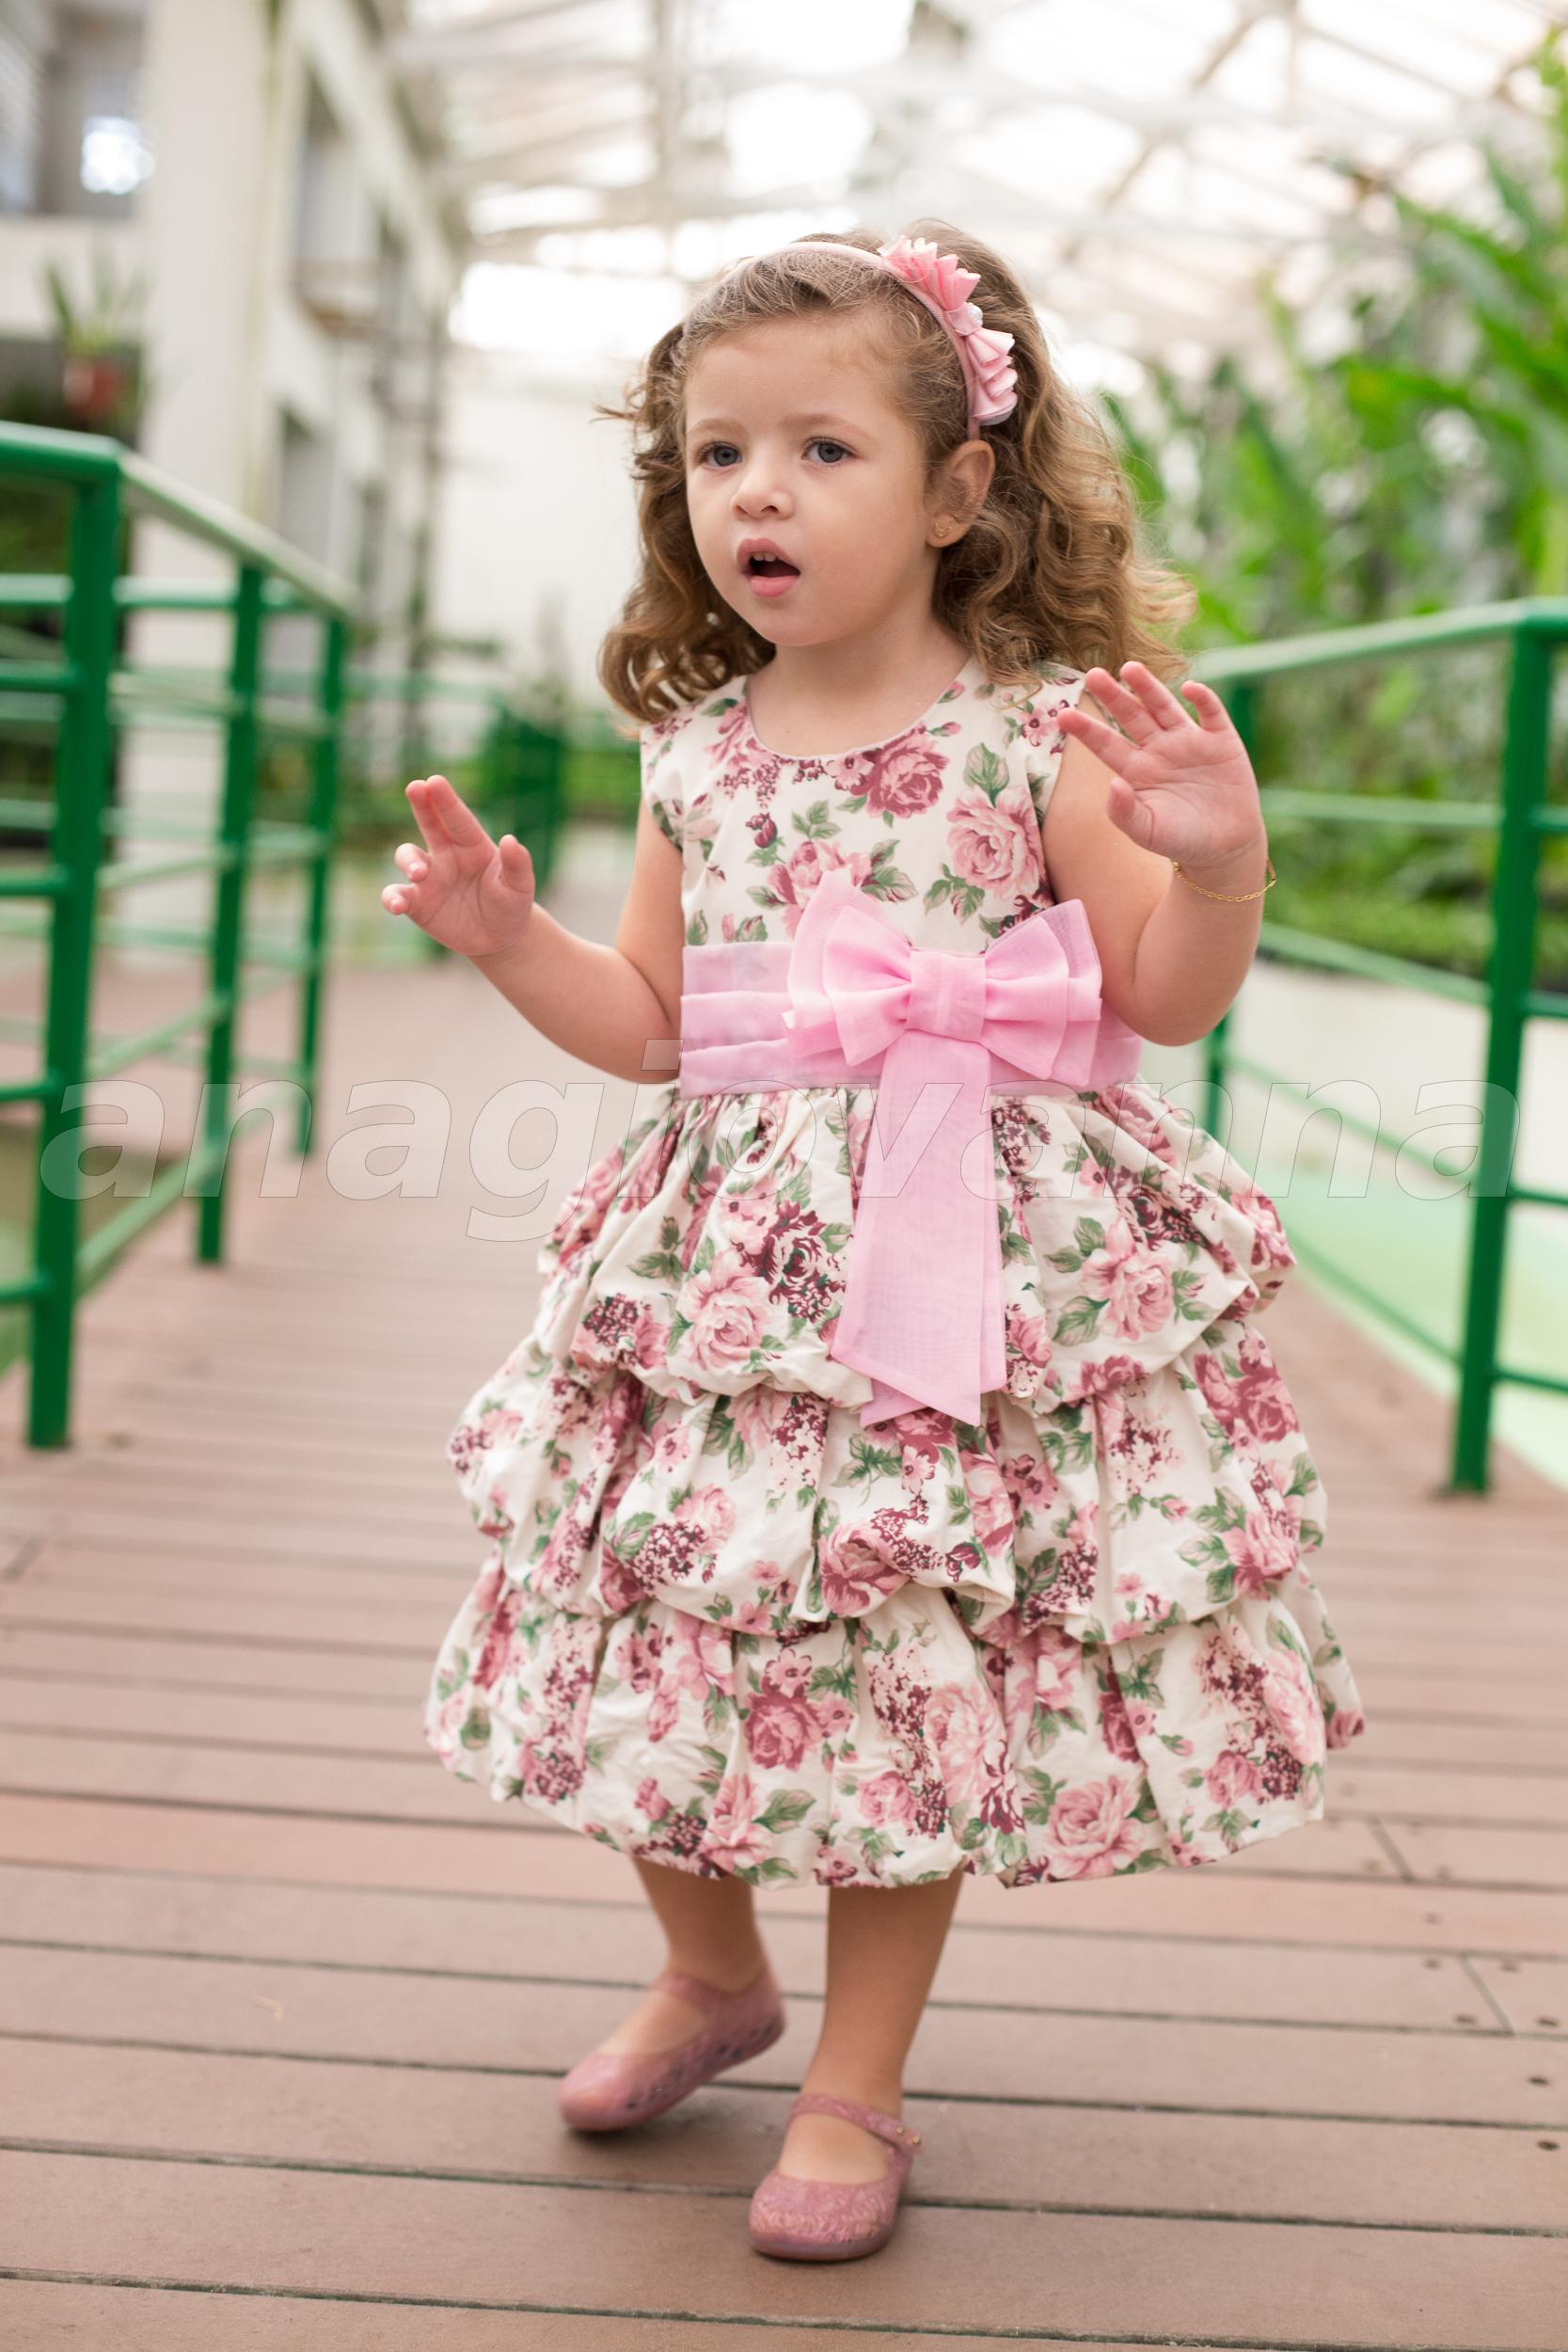 994613678 Vestido Infantil Floral Rosa no Elo7 | AnaGiovanna Vestidos Infantis  (579CCE)